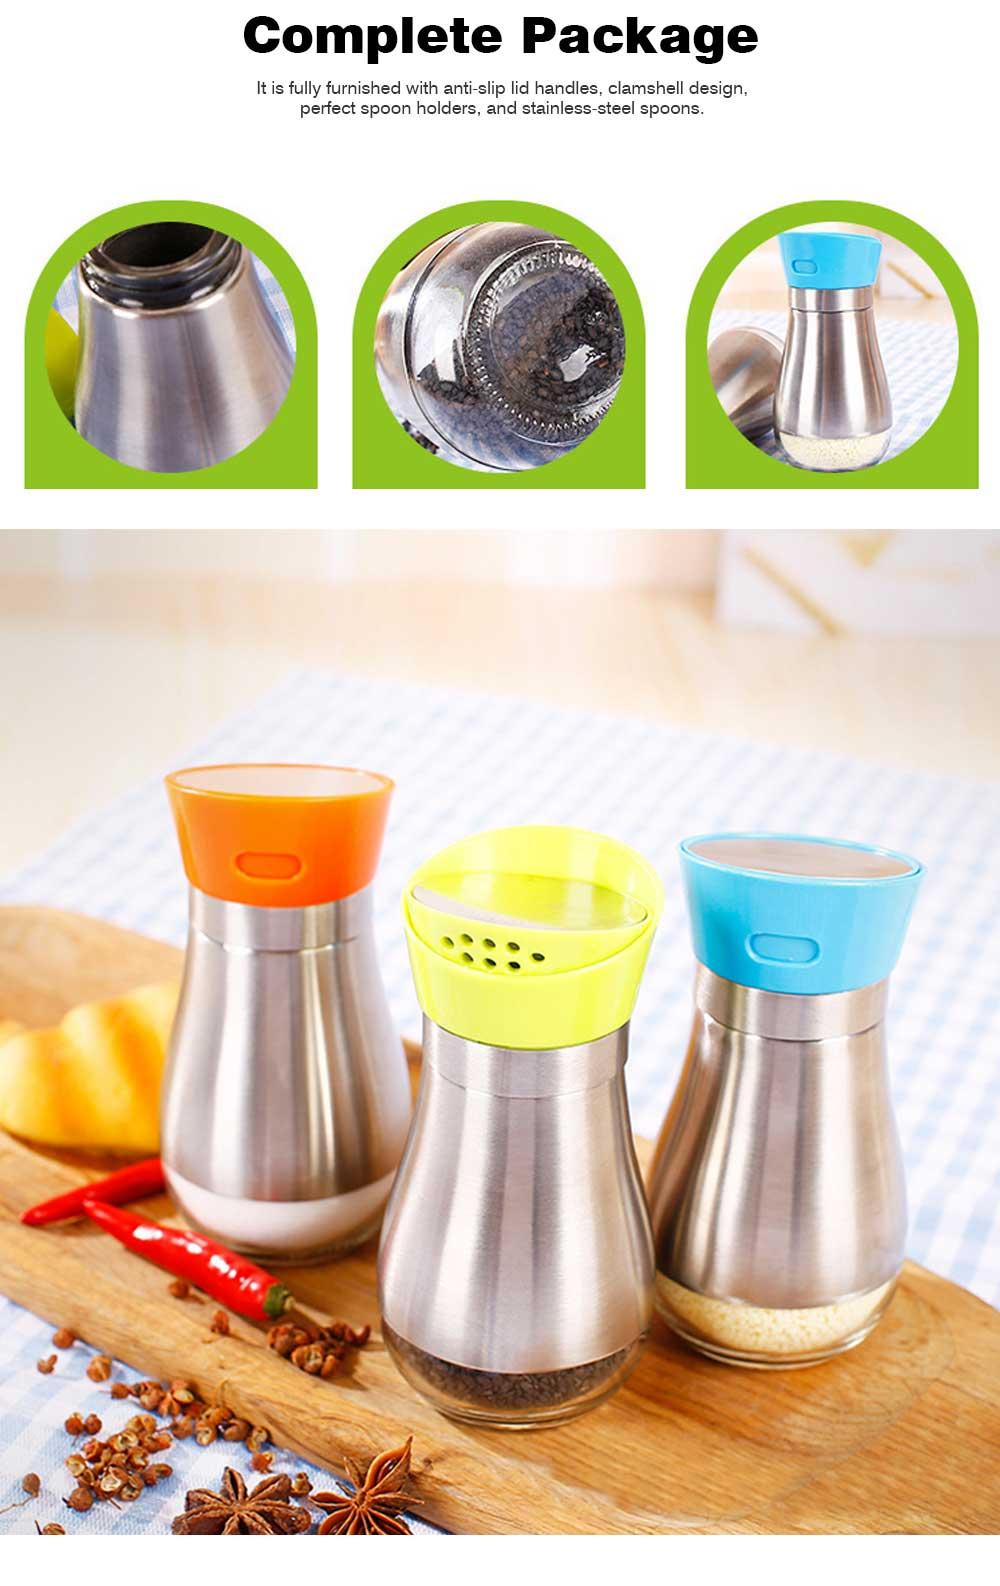 Stainless-steel Sauce Bottle for Putting Pepper, Salt, Chicken Essence, Double-Opening Seasoning Glass Bottle 2